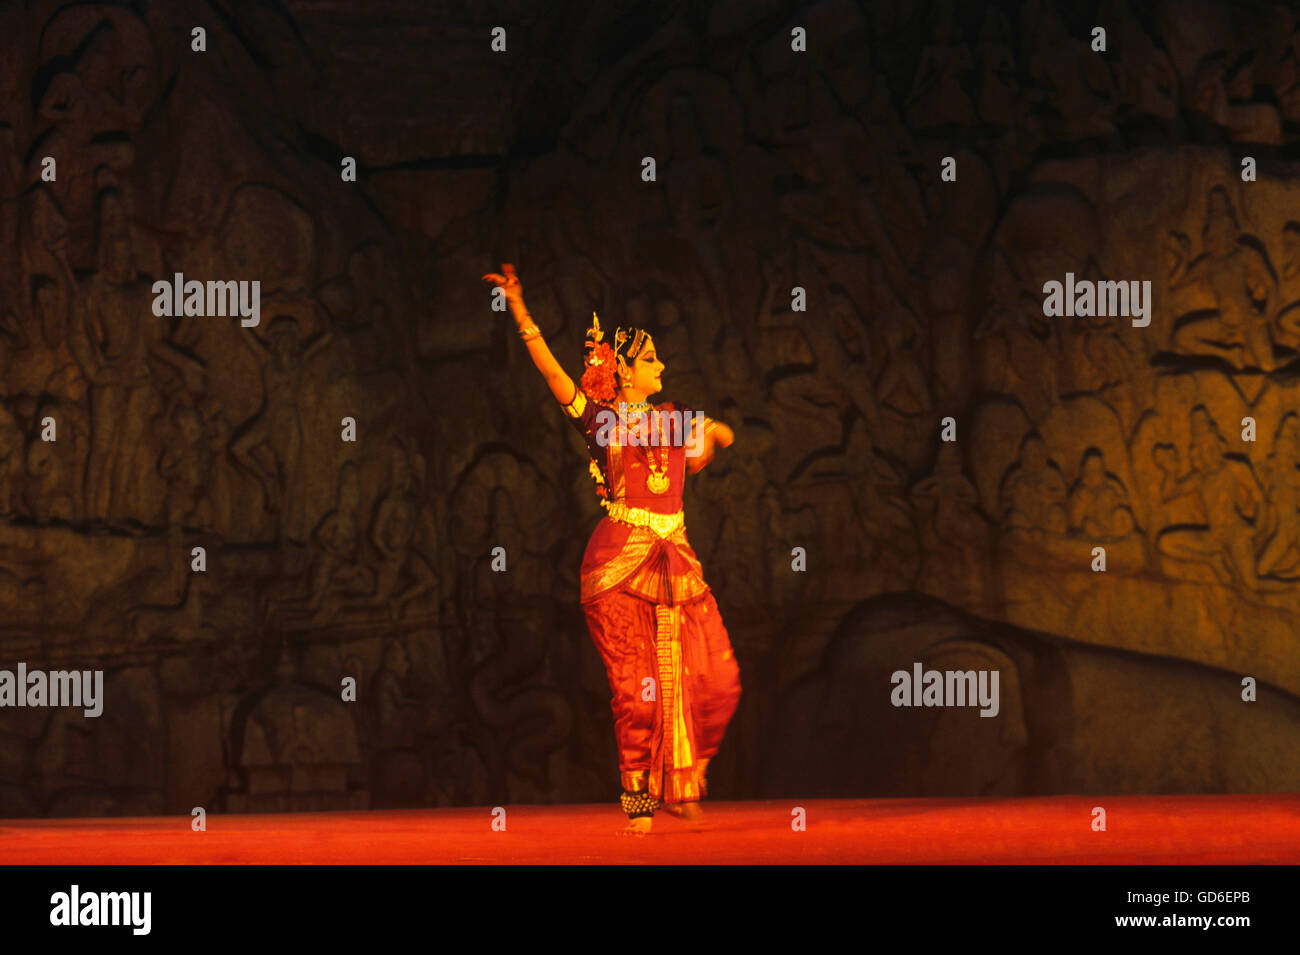 Artiste dancing - Stock Image